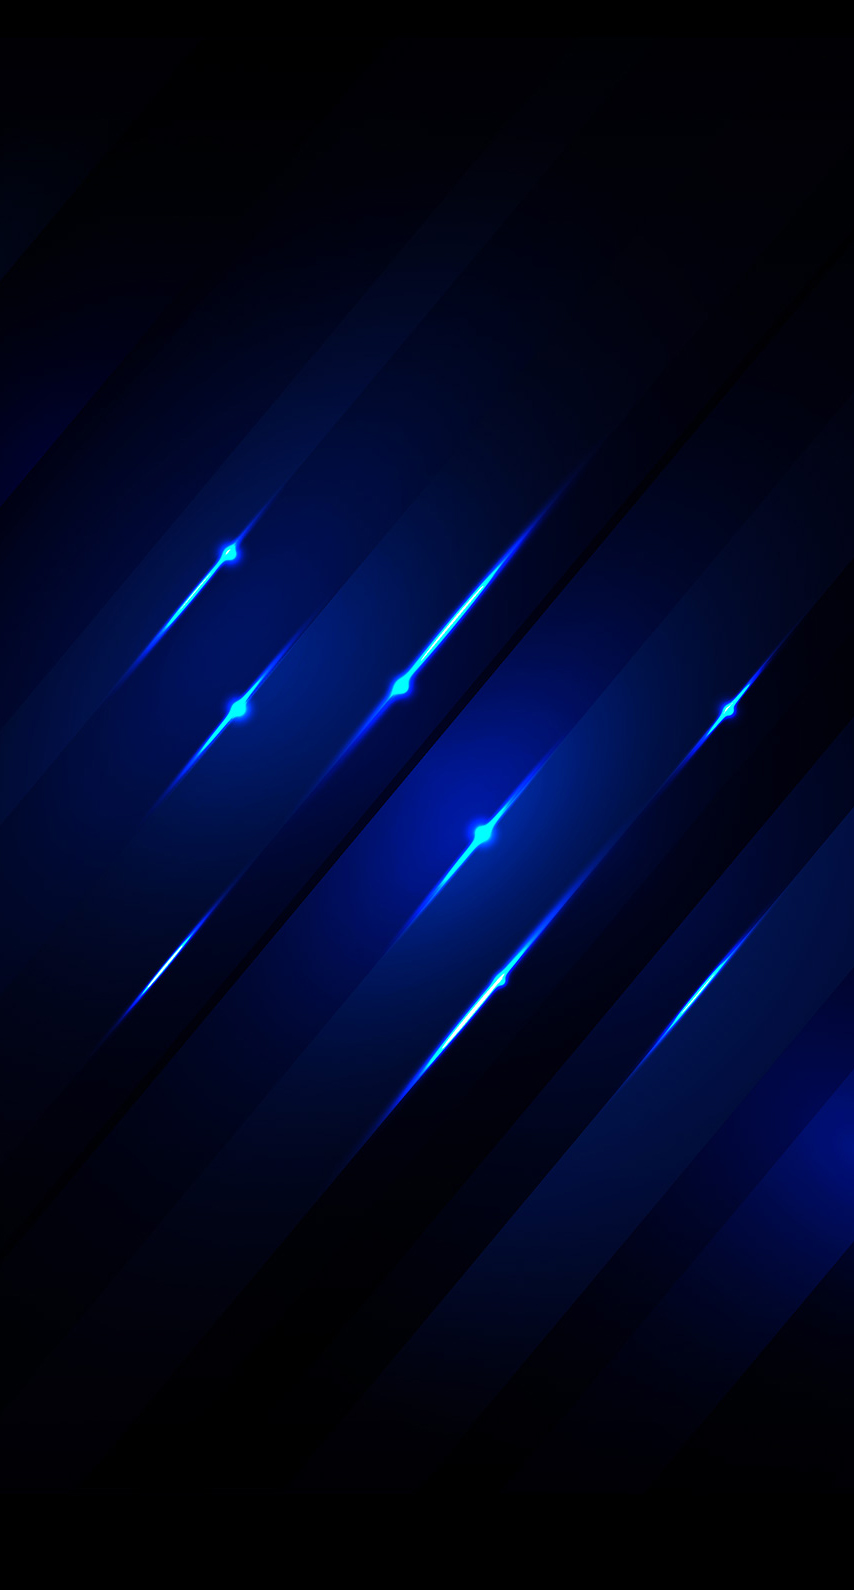 futuristic, stripes